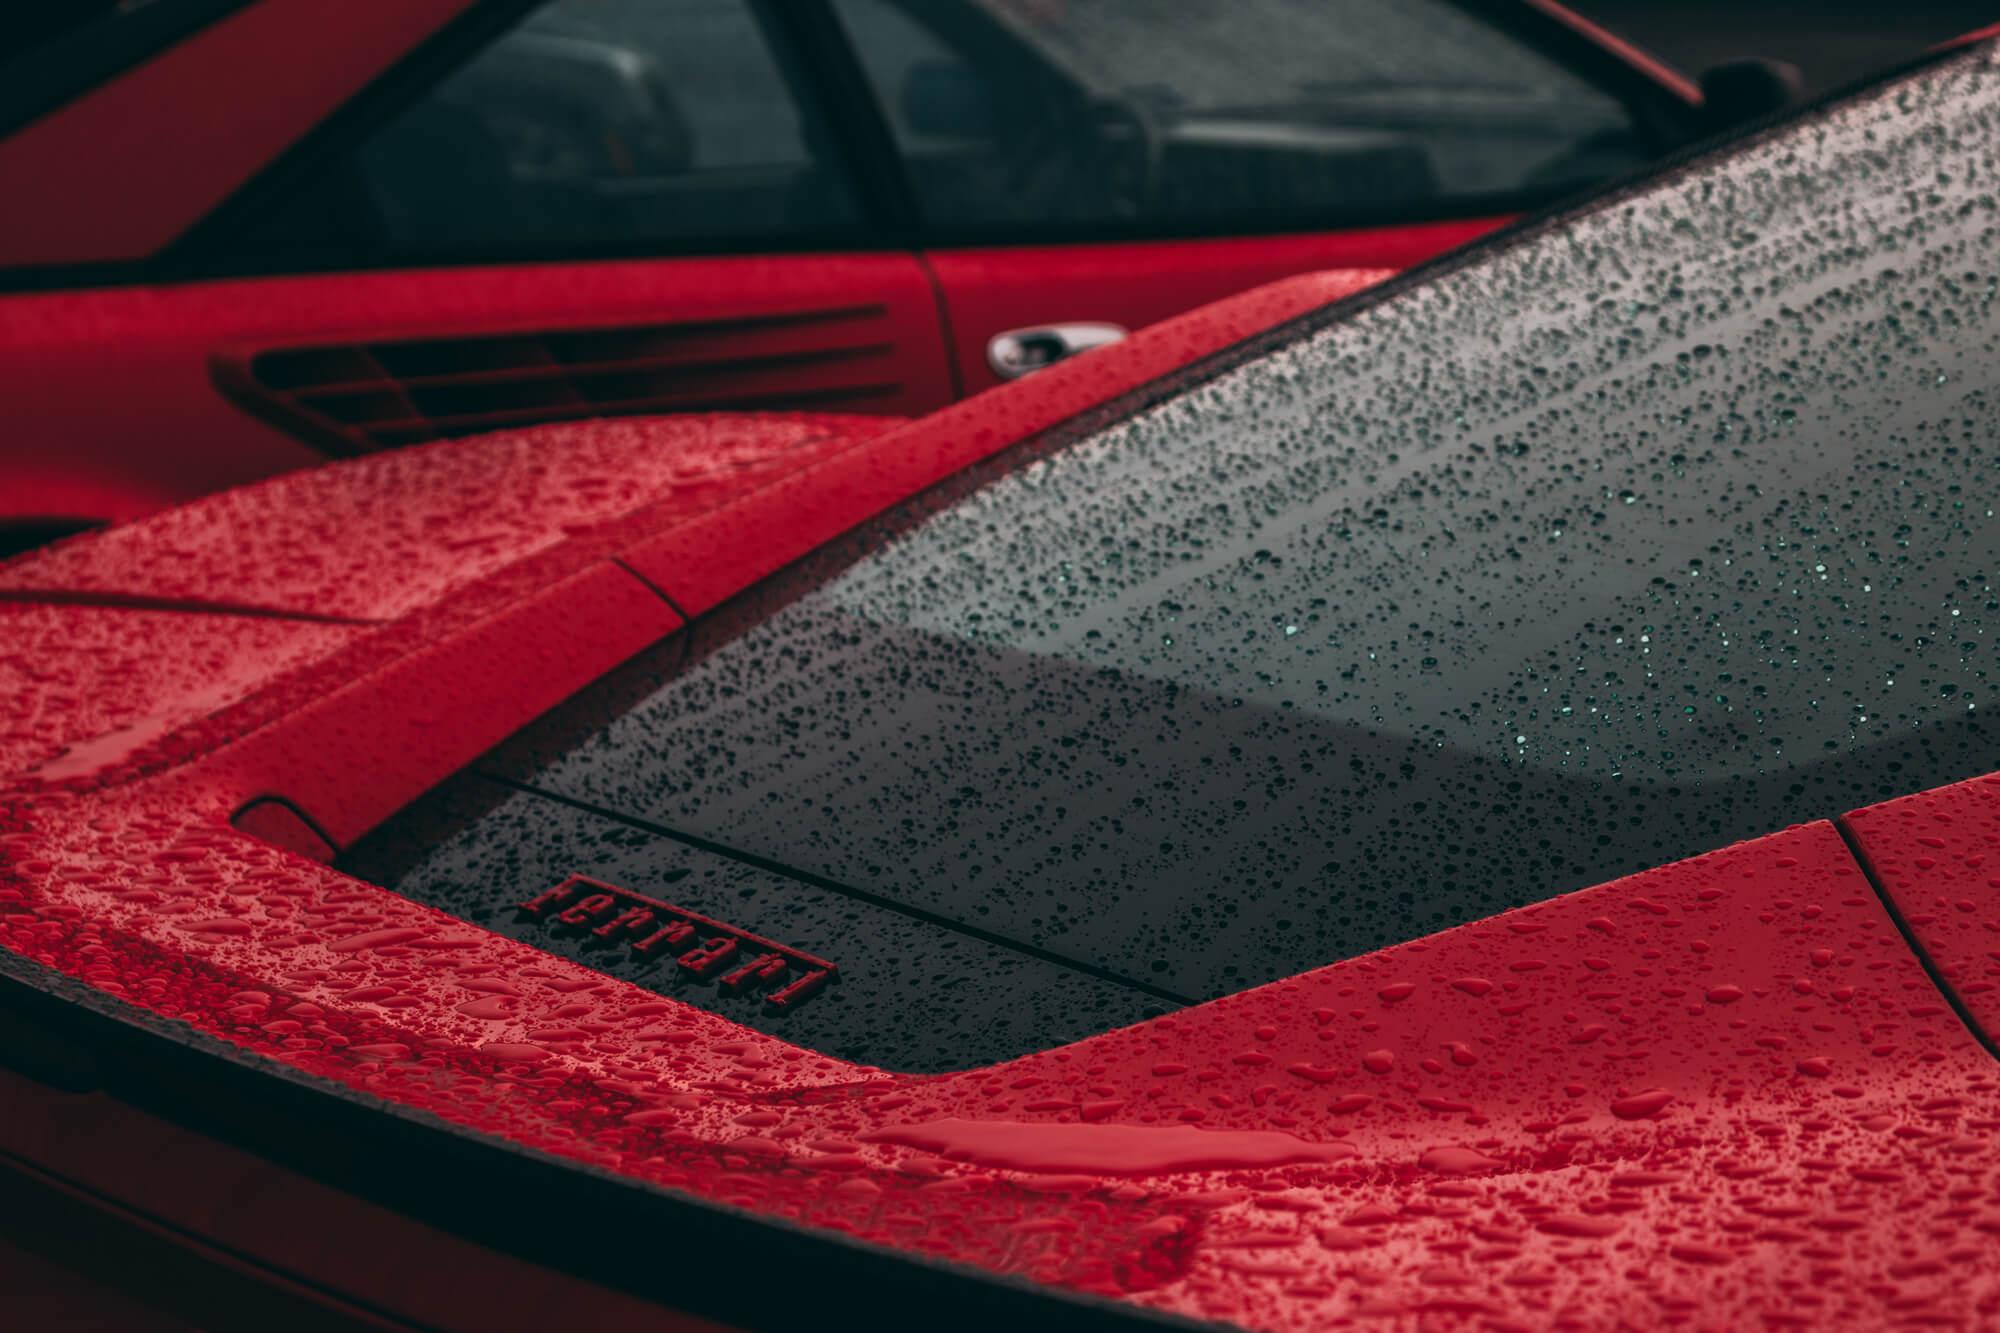 Cuántos caballos tiene un Ferrari